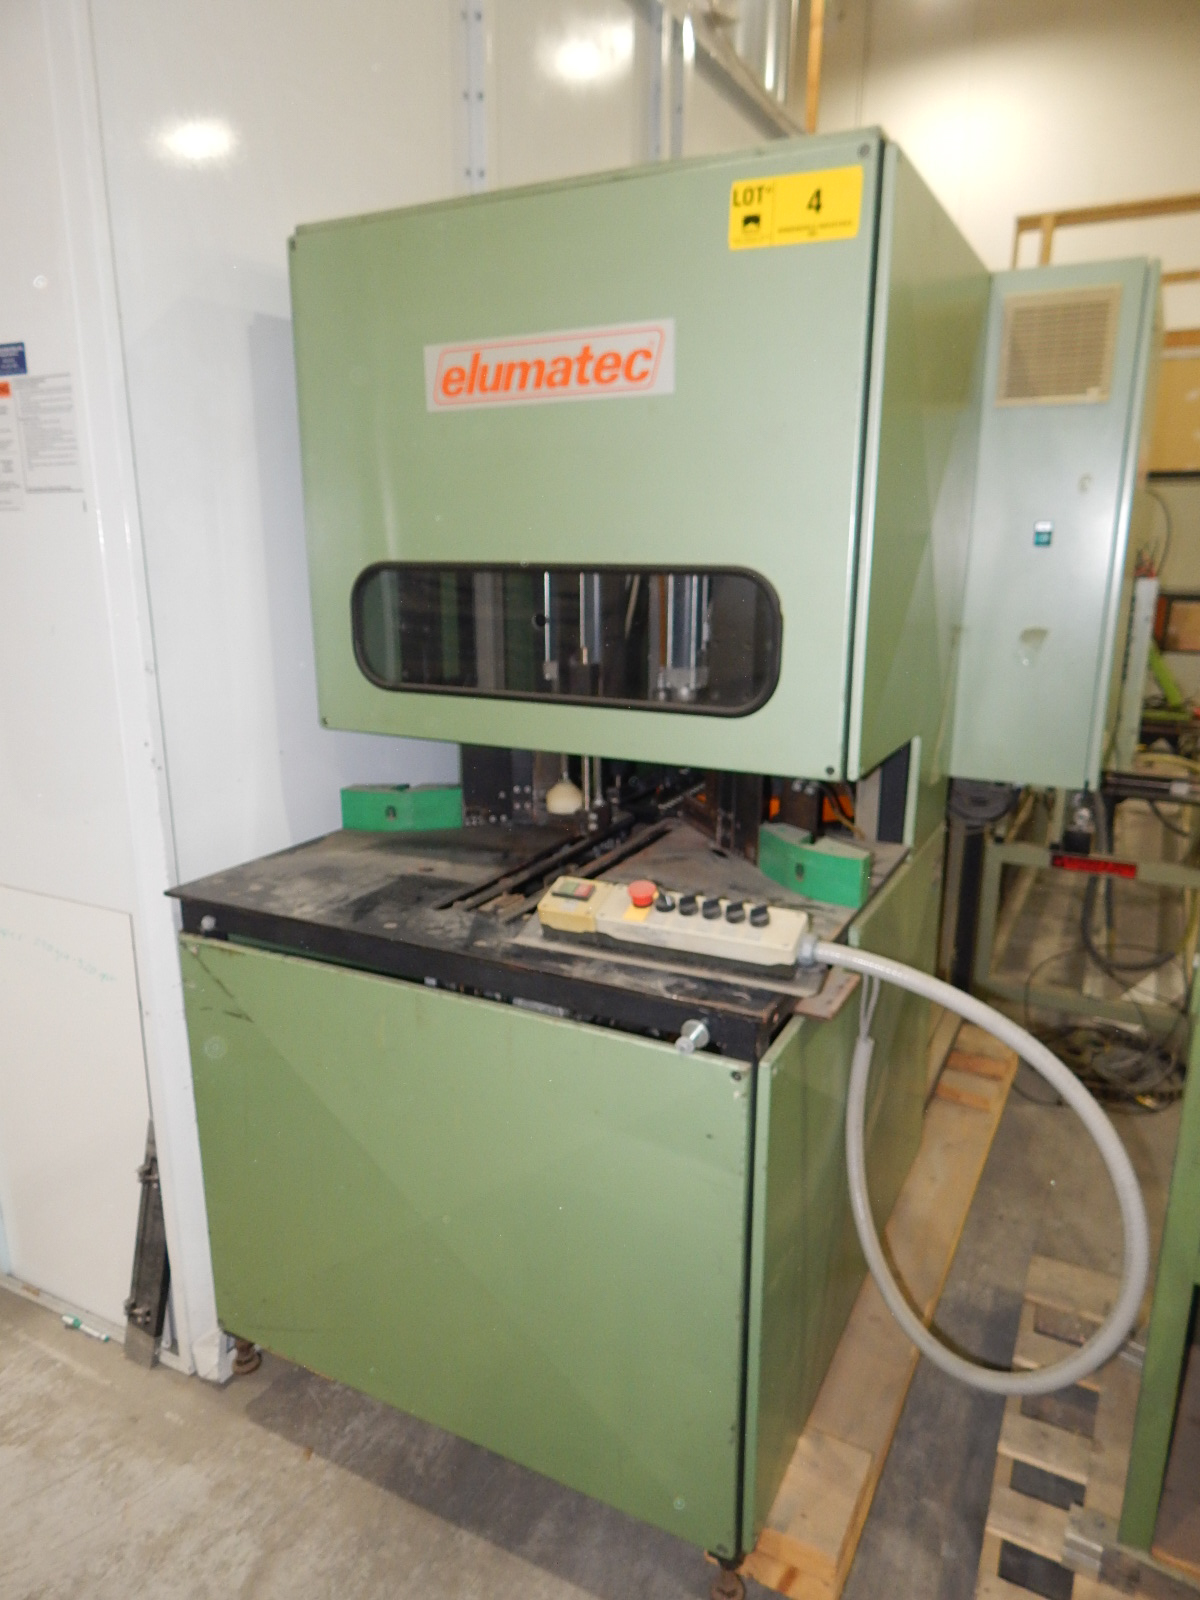 ELUMATEC 180/WP-3RU SINGLE HEAD CORNER CLEANER WITH 3,400 RPM, 230V/3PH/60HZ, S/N: 2009 (CI)